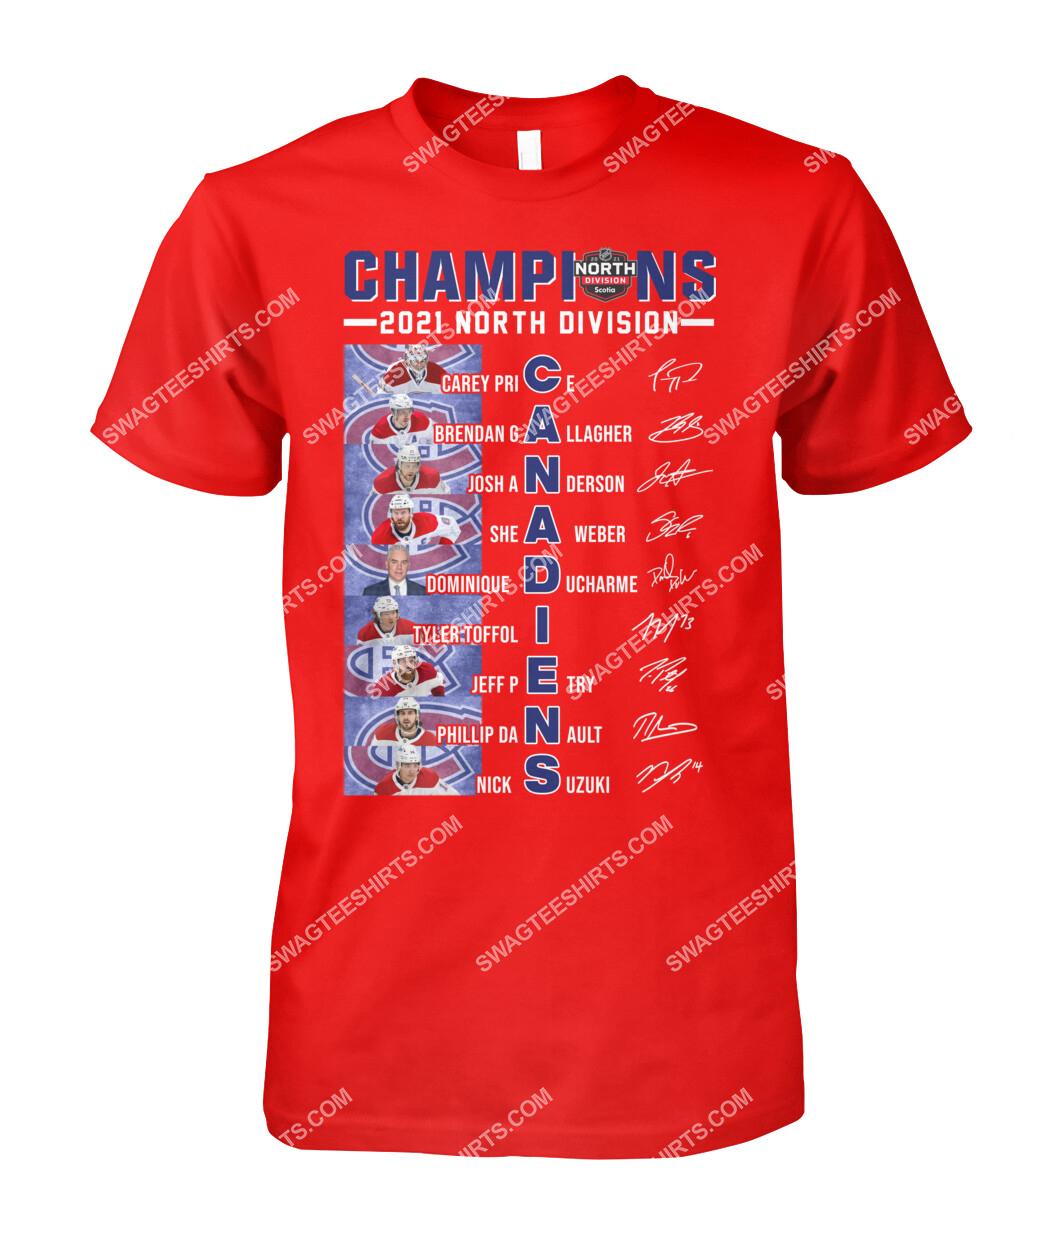 2021 north division champions montreal canadiens signatures tshirt 1